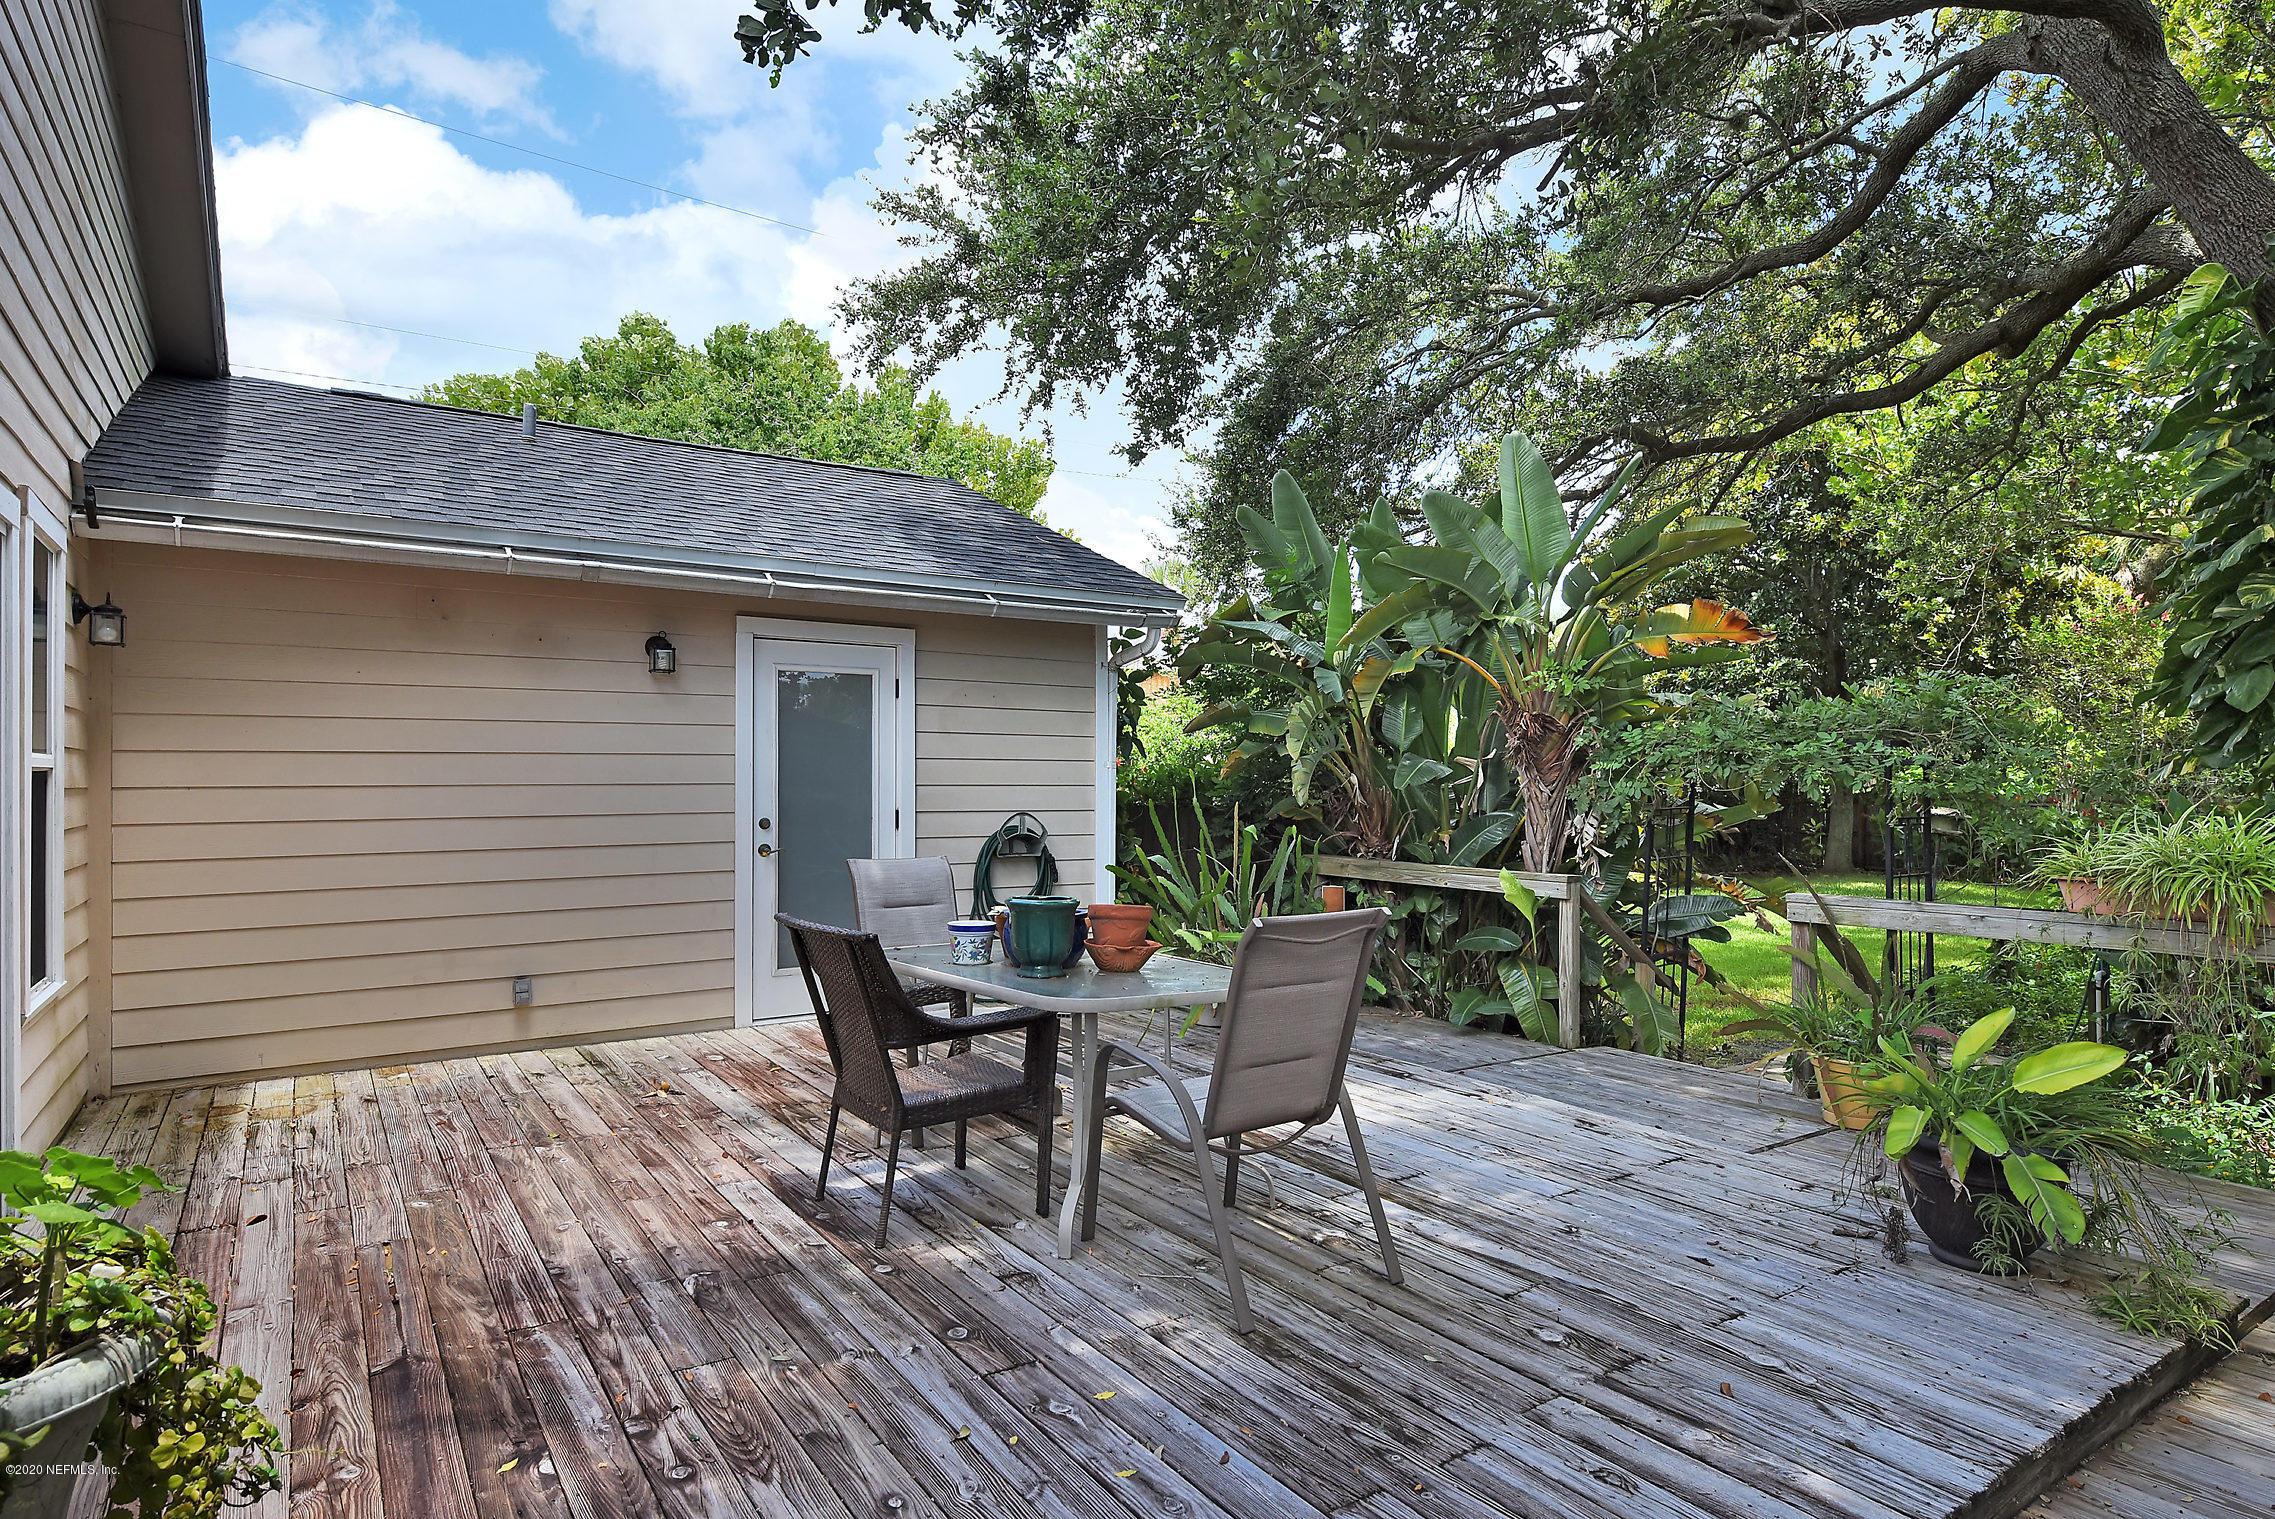 438 ST AUGUSTINE, JACKSONVILLE BEACH, FLORIDA 32250, 3 Bedrooms Bedrooms, ,4 BathroomsBathrooms,Residential,For sale,ST AUGUSTINE,1079725